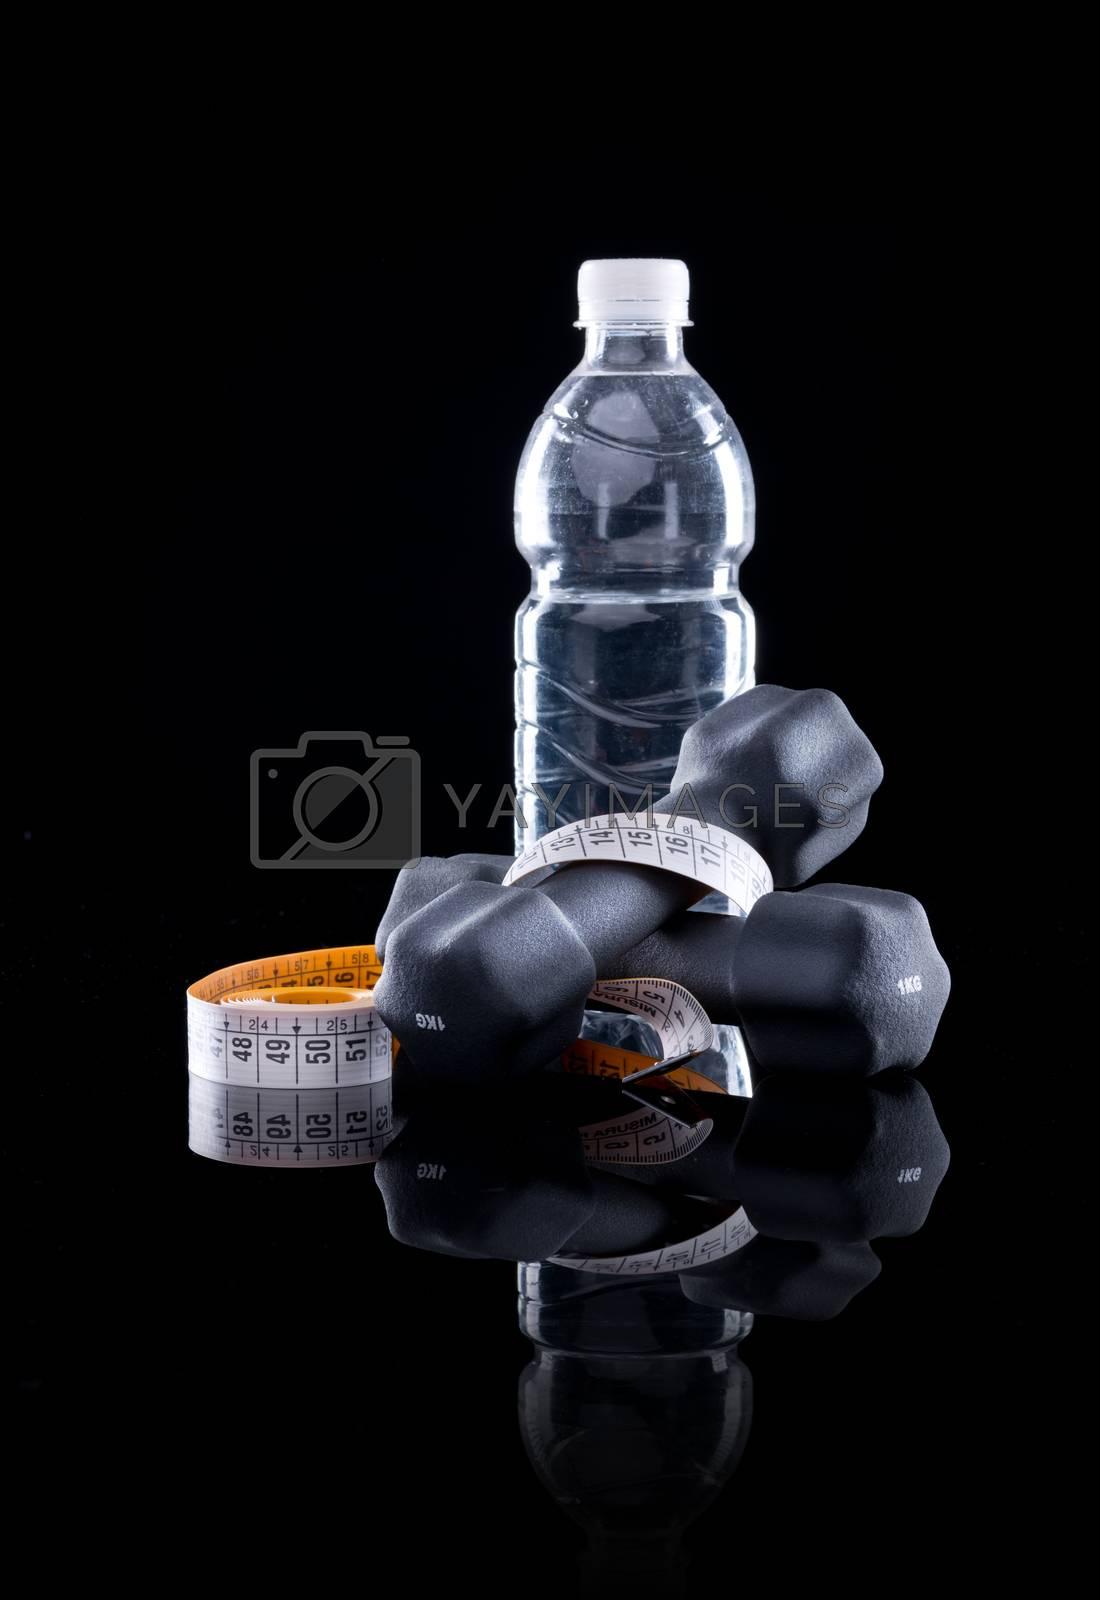 Water bottle, measure tape and dumbbells on black background.